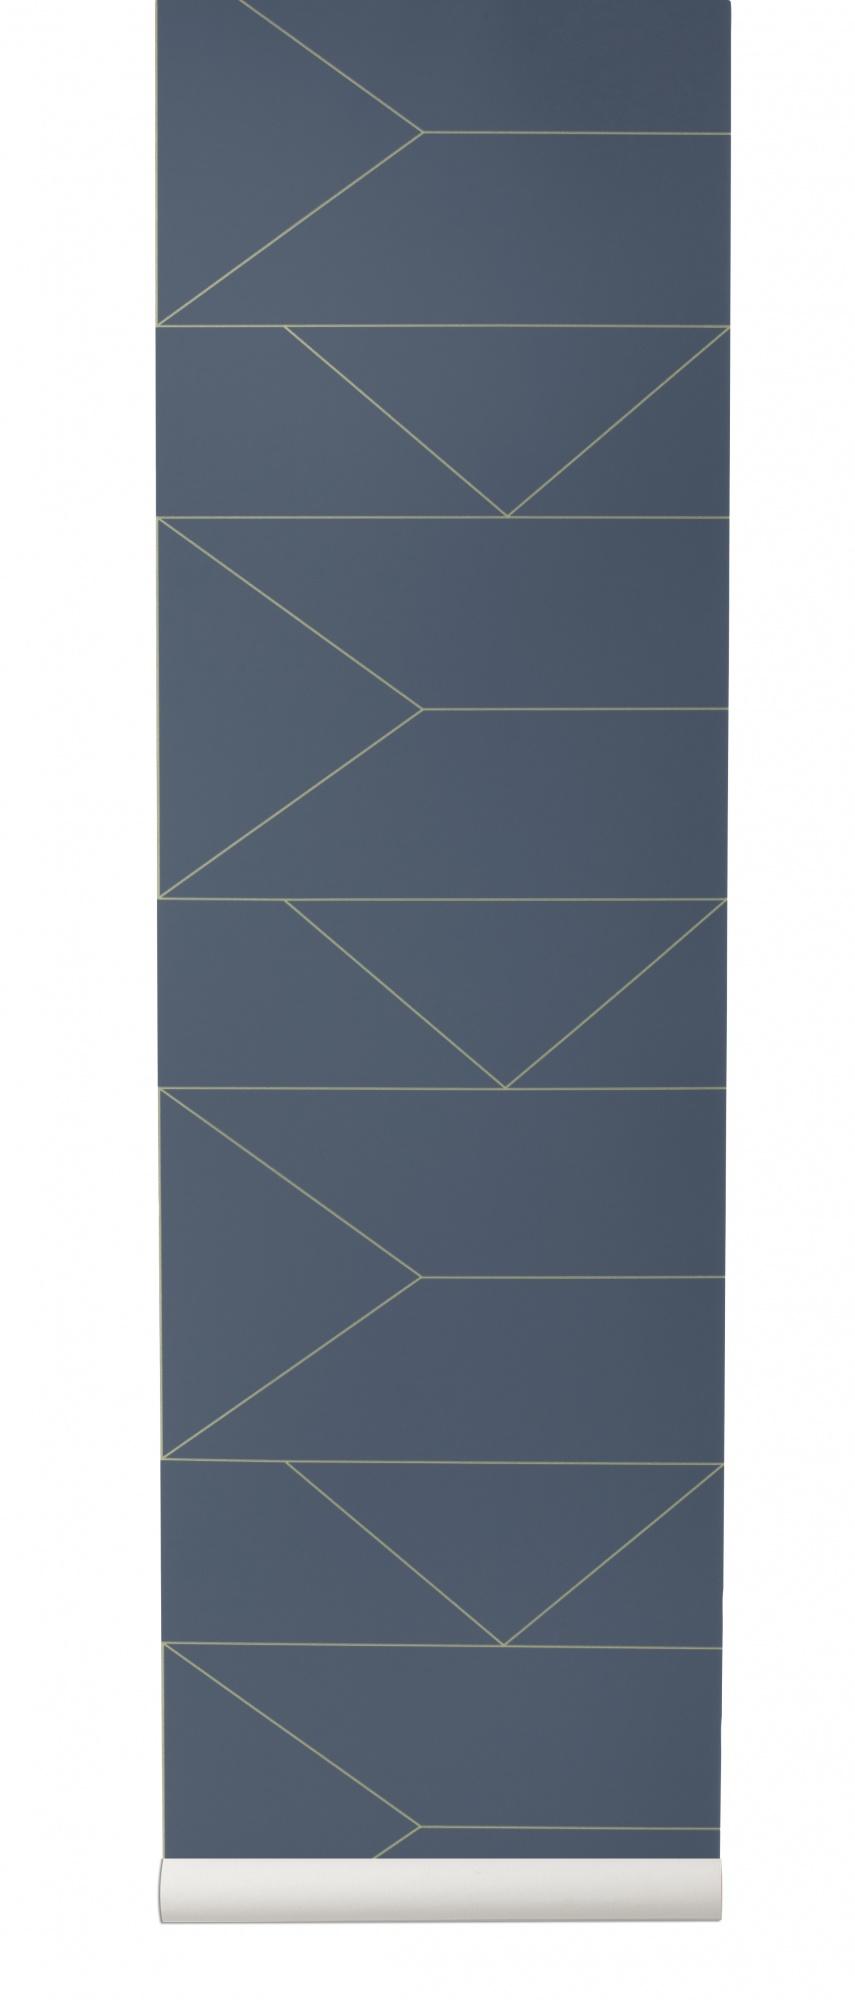 tapeta skandynawska lines granatowa ferm living. Black Bedroom Furniture Sets. Home Design Ideas